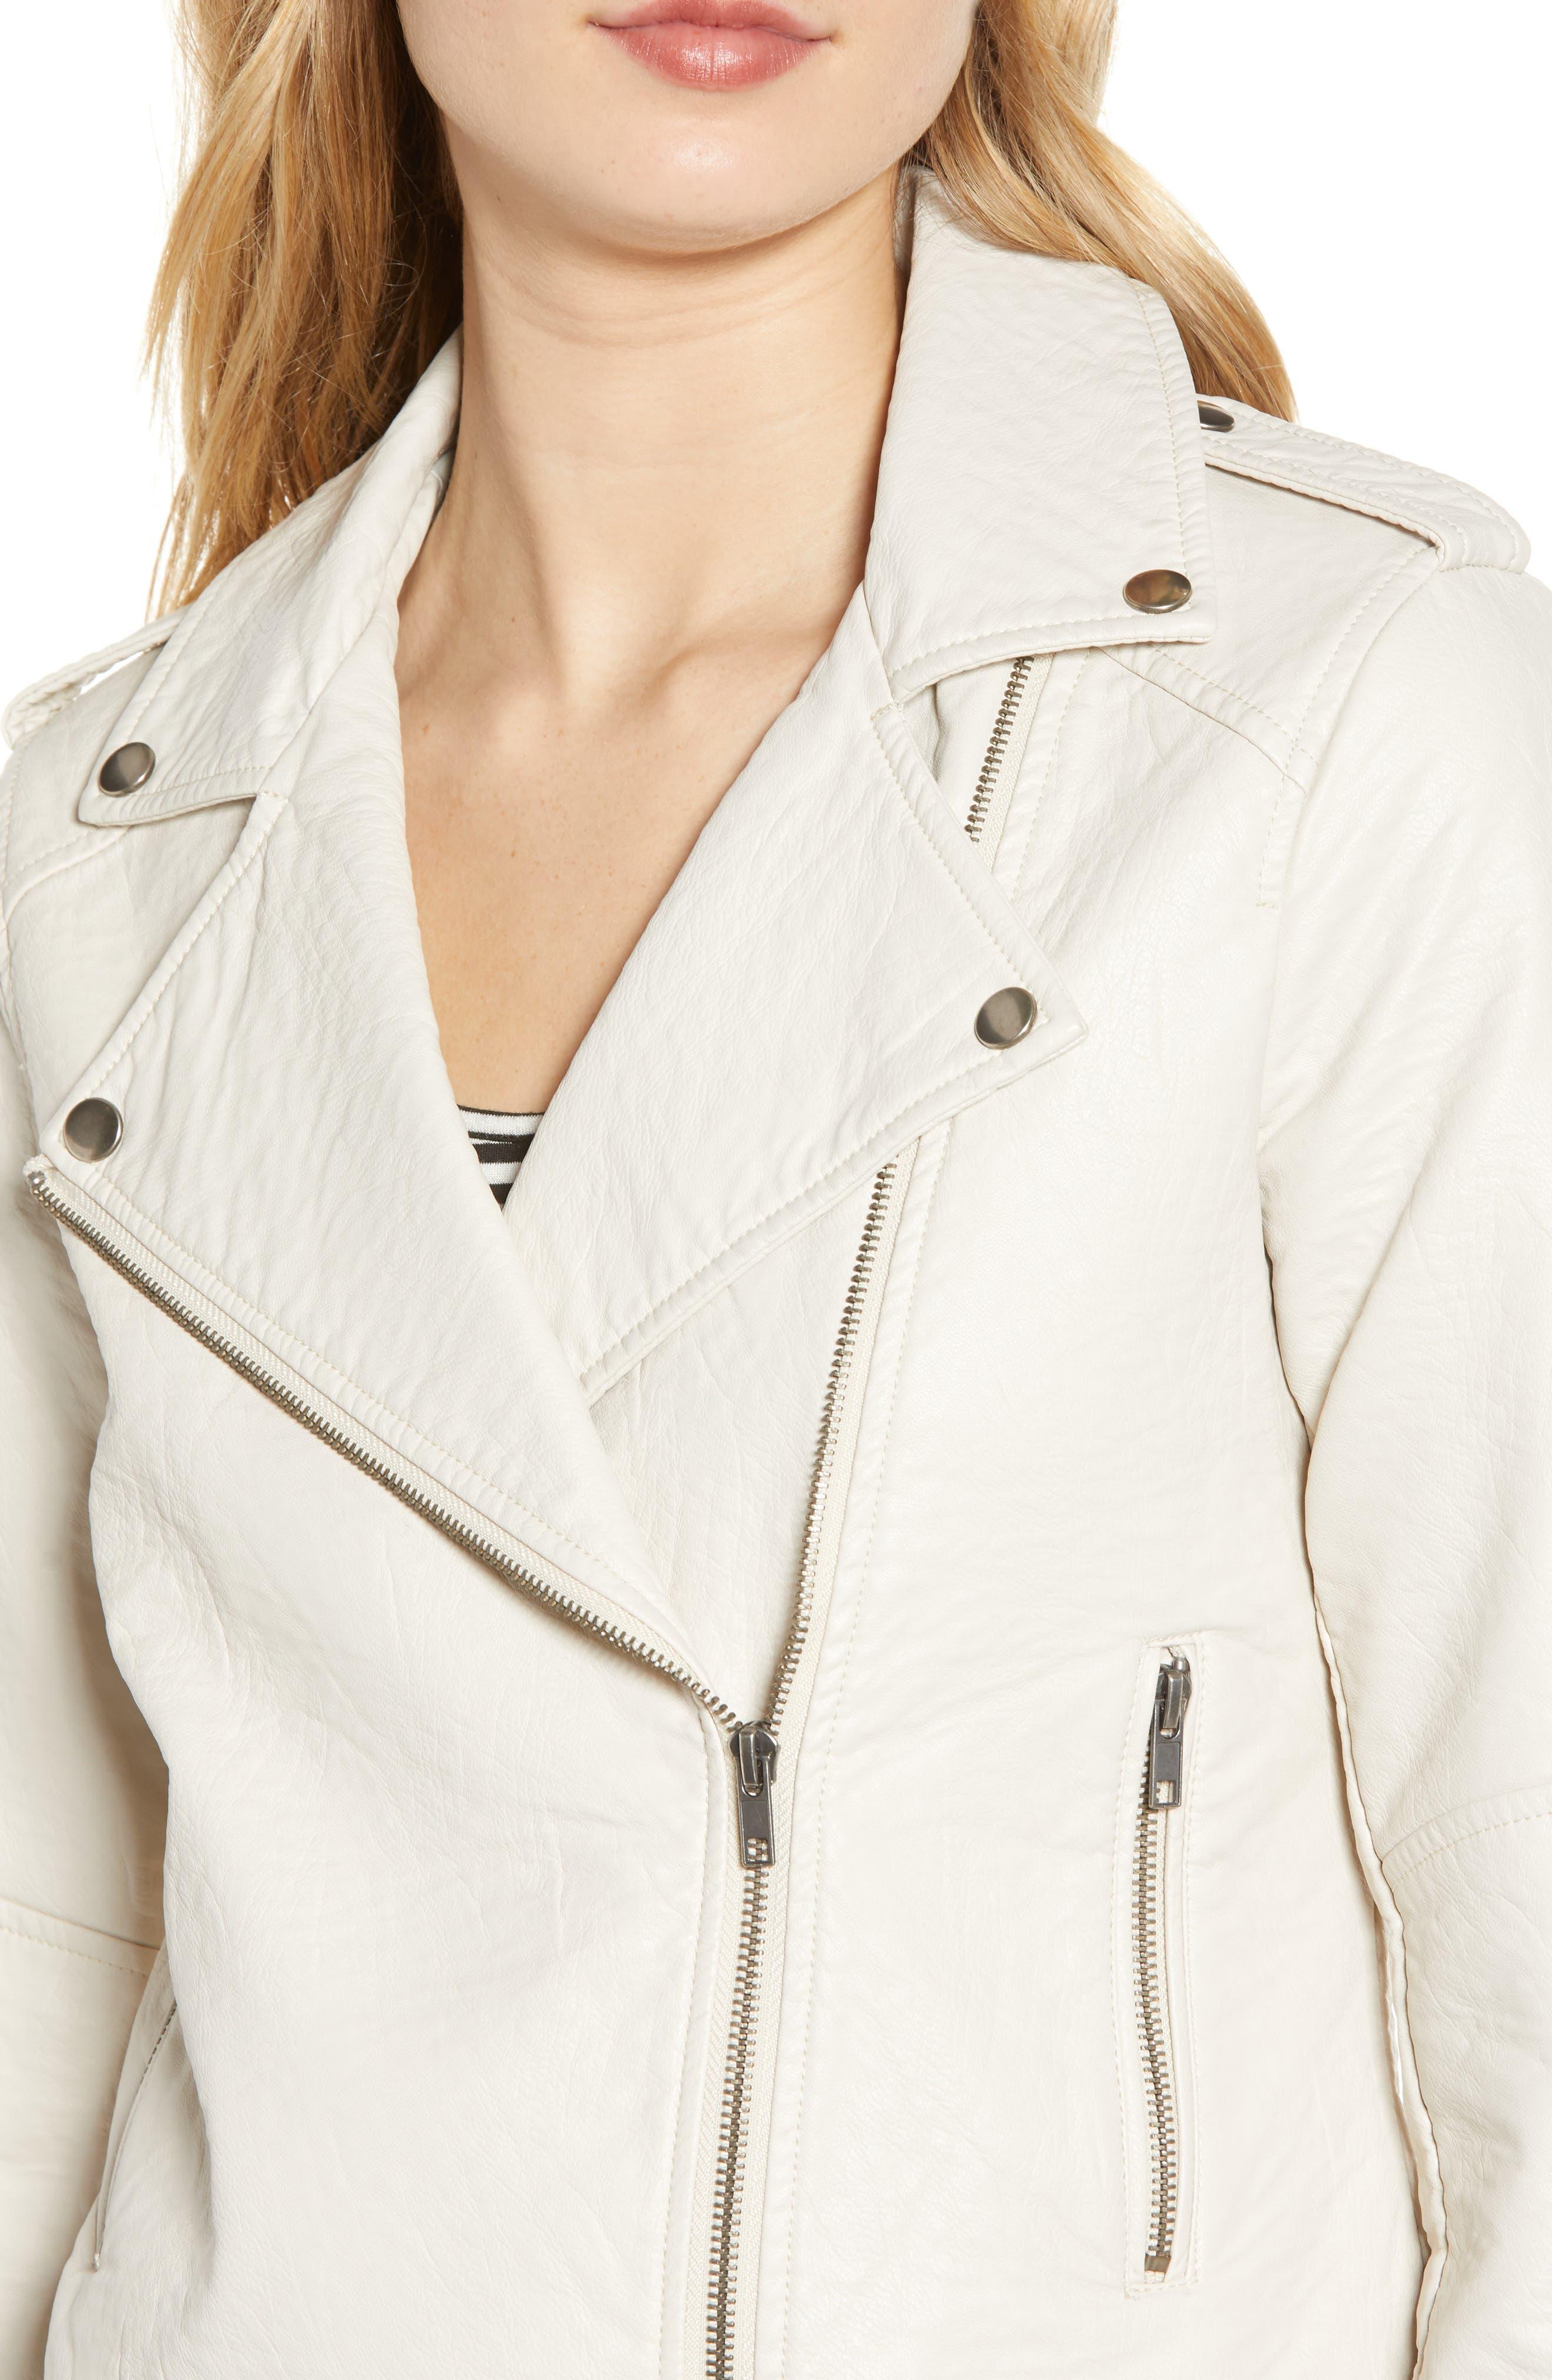 CUPCAKES AND CASHMERE, Vivica Faux Leather Jacket, Alternate thumbnail 5, color, BONE